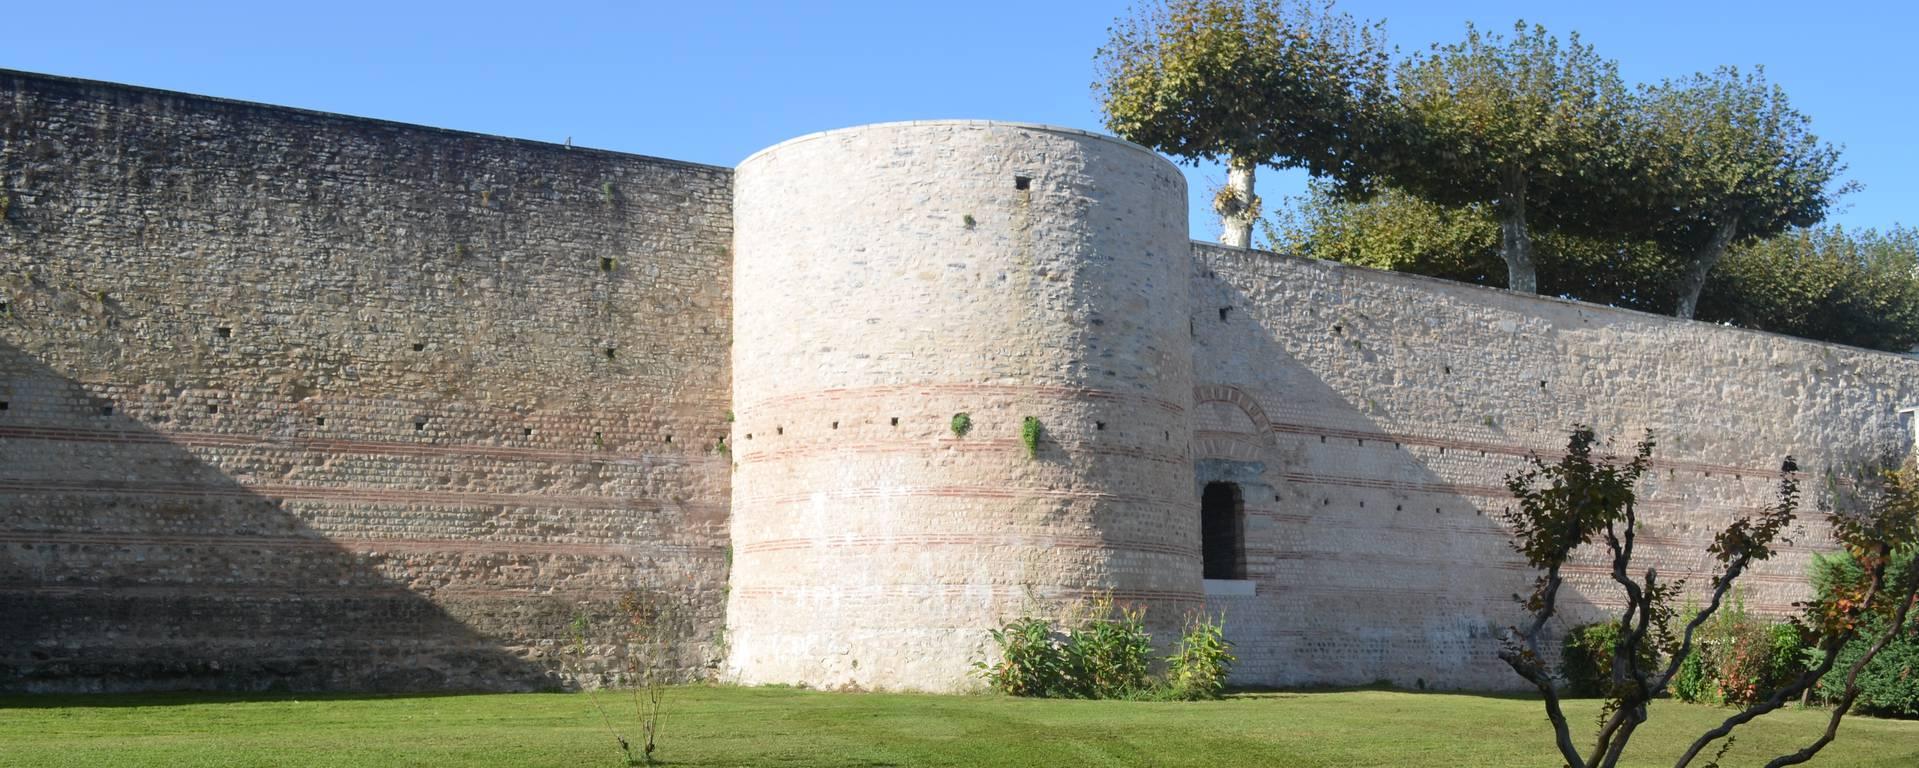 Remparts de Dax